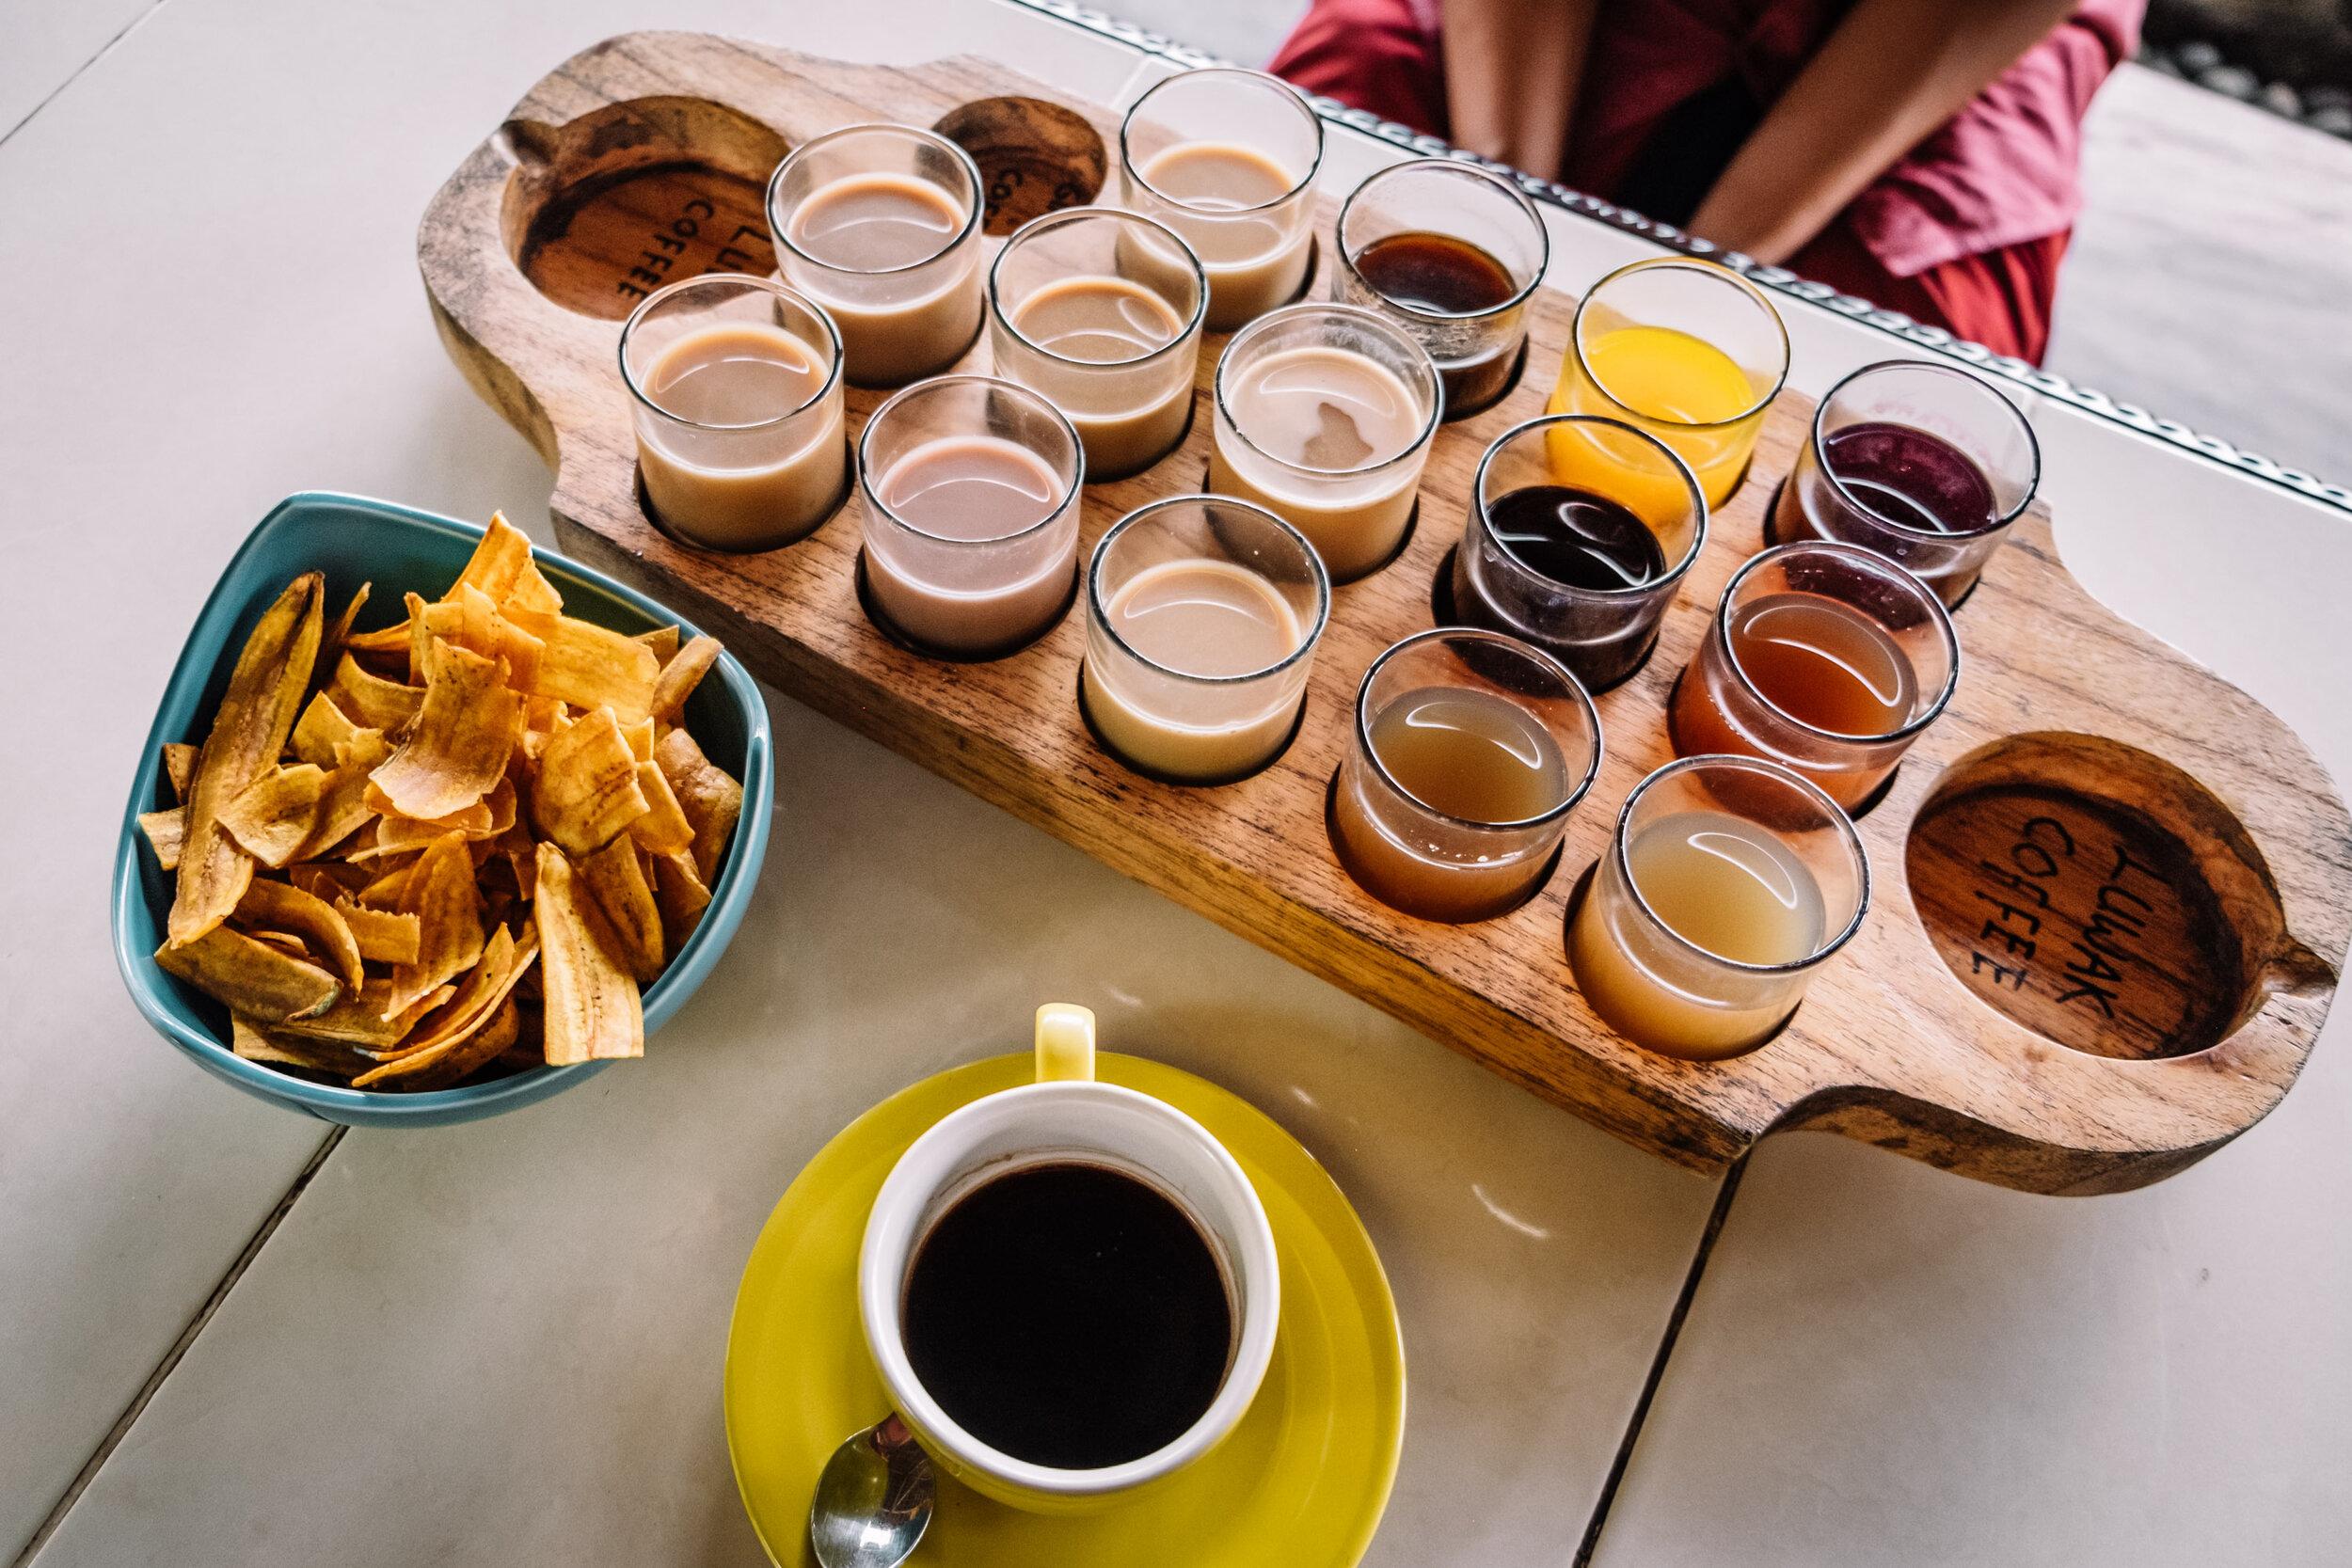 Rachel Off Duty: Coffee and Tea Plantation in Bali